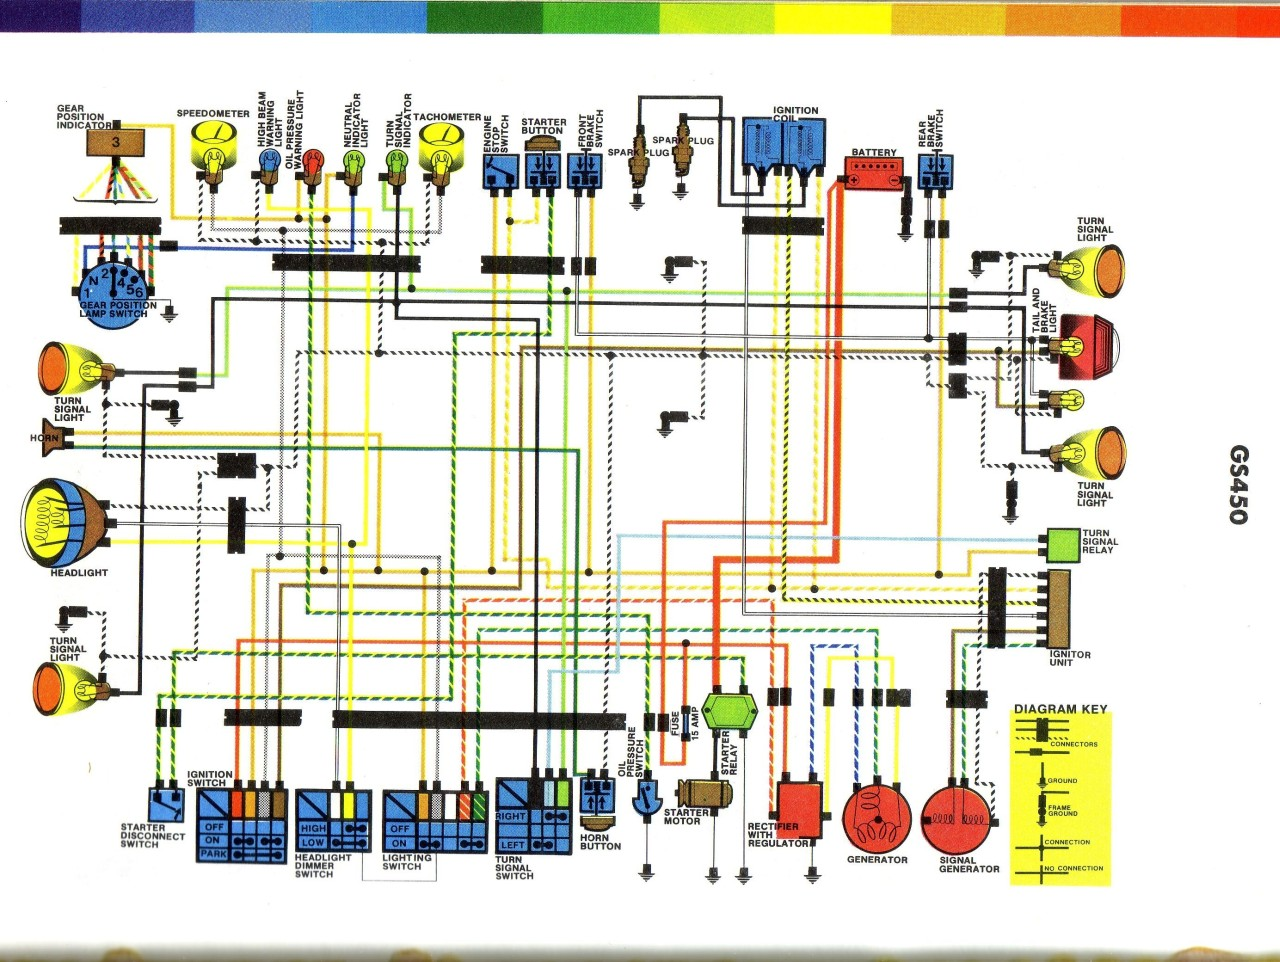 Samurai Wire Diagram - Wiring Diagram Dash on 2002 mercury mountaineer wiring diagram, 1988 suzuki samurai manifold diagram, 1968 camaro gauge cluster diagram, 1994 suzuki sidekick fuse box wiring diagram, 2000 xplorer 4x4 wiring diagram, 1987 dodge dakota wiring diagram, suzuki samurai front axle diagram, 1985 toyota pickup wiring diagram, suzuki samurai transmission diagram, 88 ford bronco wiring diagram, suzuki samurai engine gasket diagram, blow up diagram, 1990 dodge w250 wiring diagram, 1980 cj5 wiring diagram, suzuki samurai 1987 fuse box diagram, 1970 ford f100 wiring diagram, 1999 cherokee wiring diagram, 1987 wrangler wiring diagram, 96 suzuki samurai engine diagram, suzuki samurai vacuum diagram,